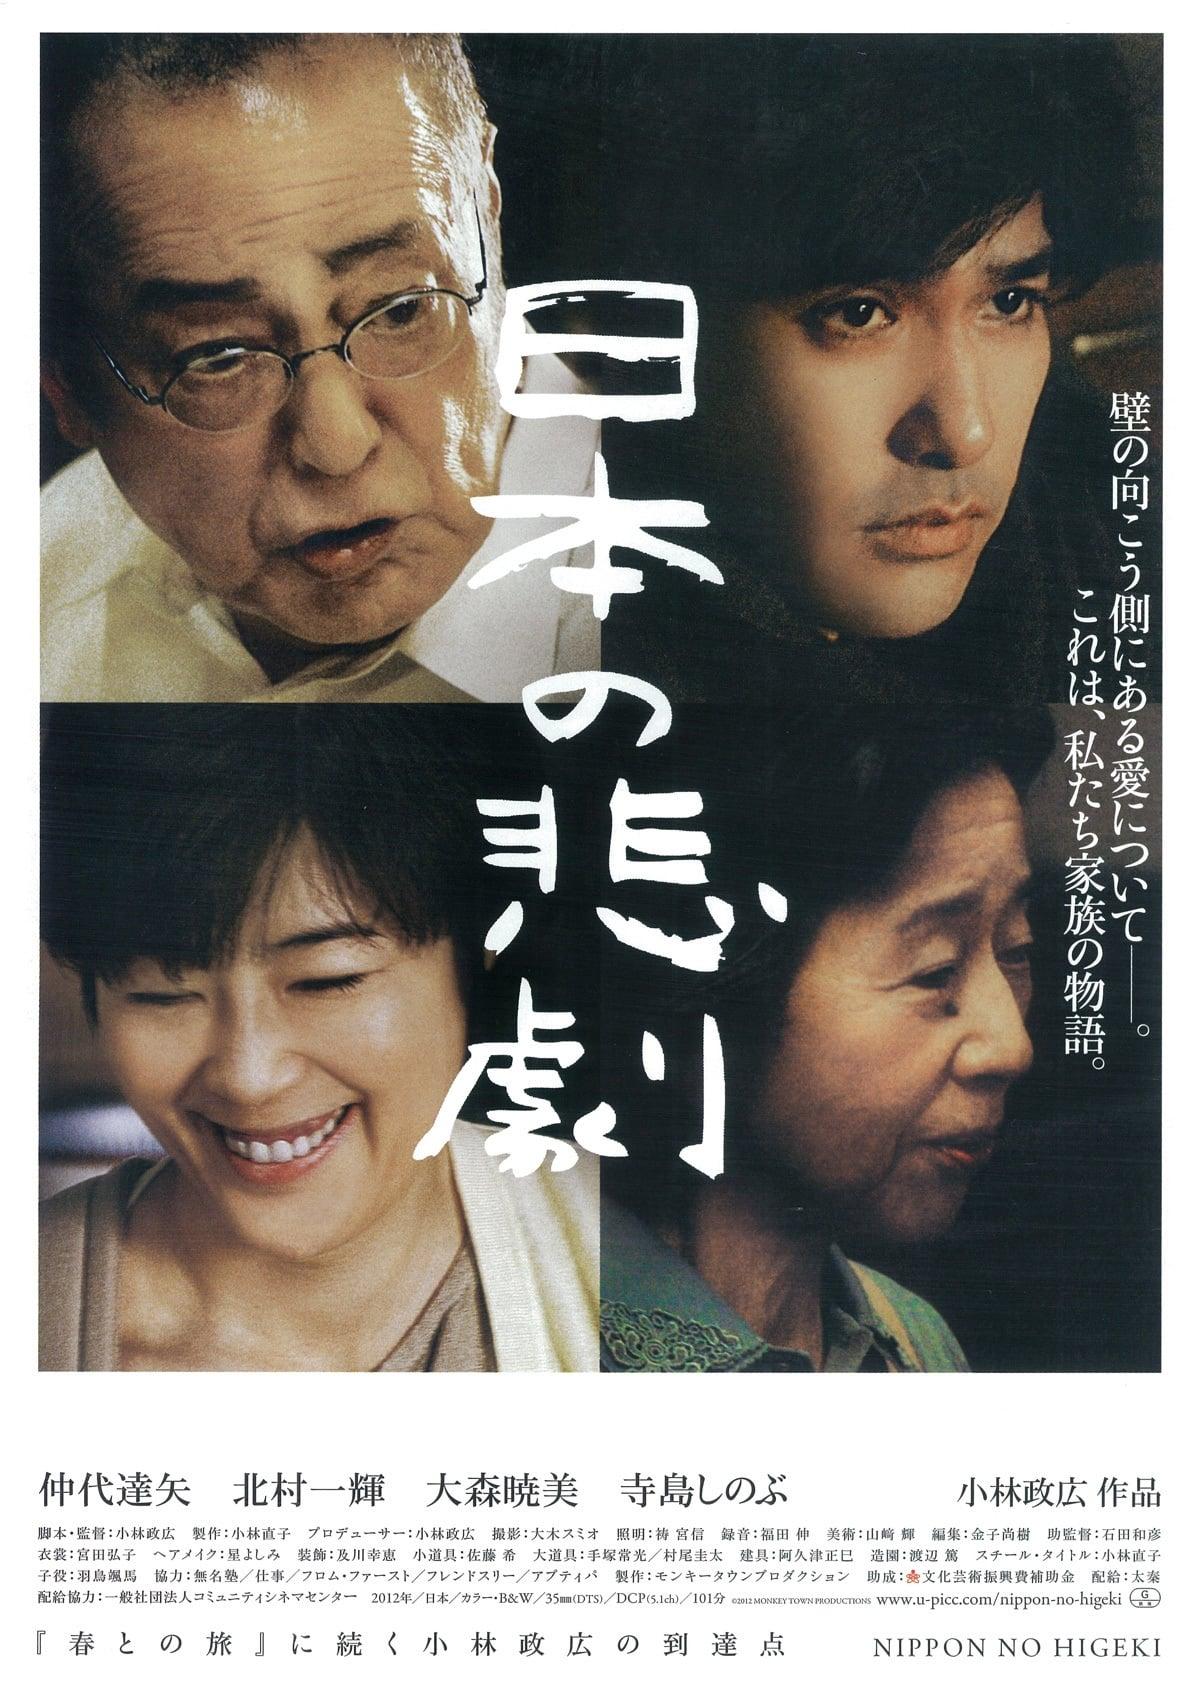 Japan's Tragedy